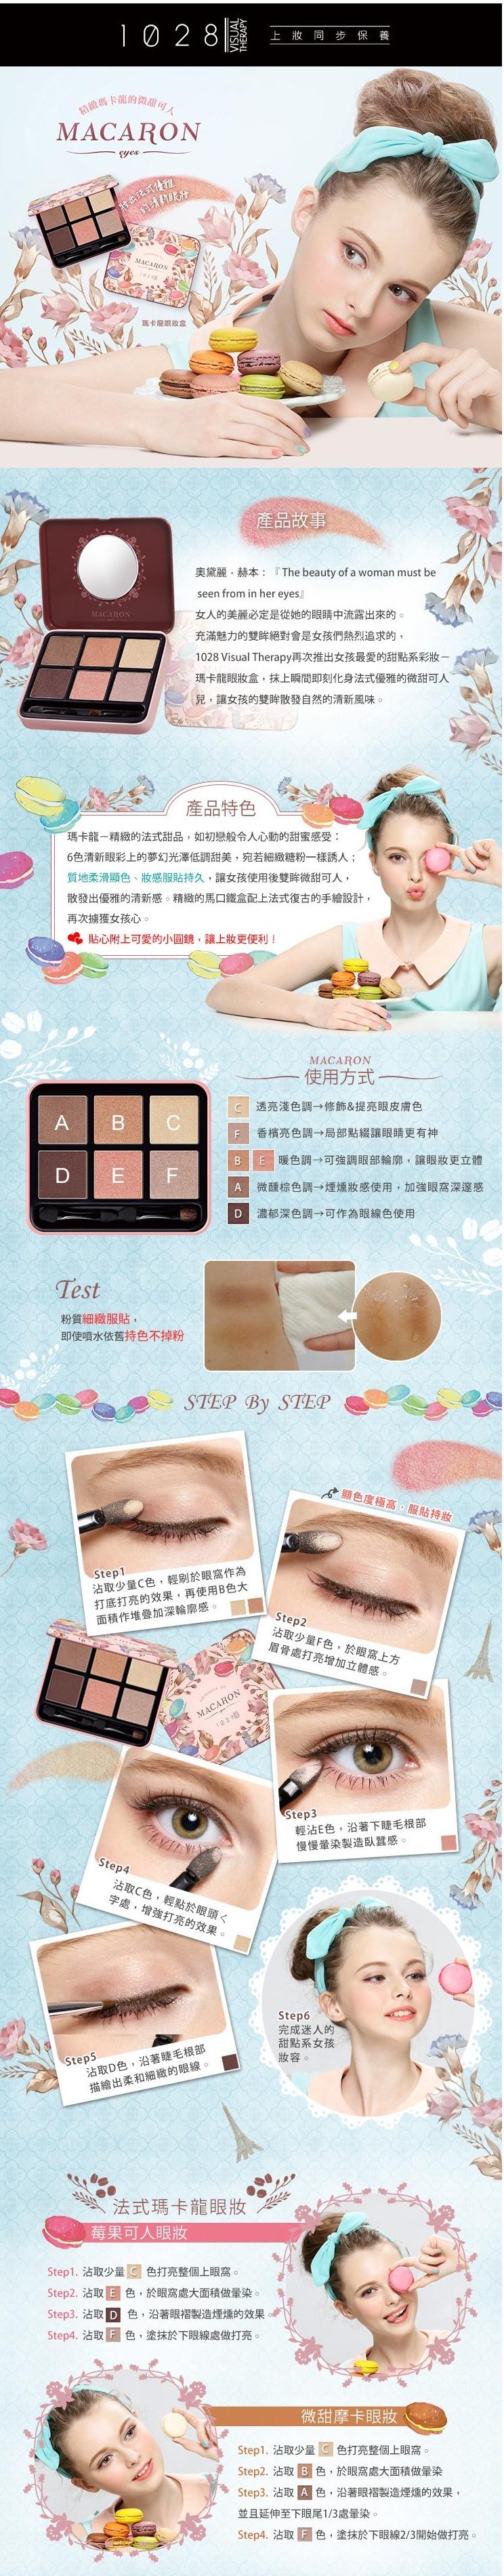 1028-visual-therapy-macaron-eyeshadow-kit-2.1gx6-1.jpg